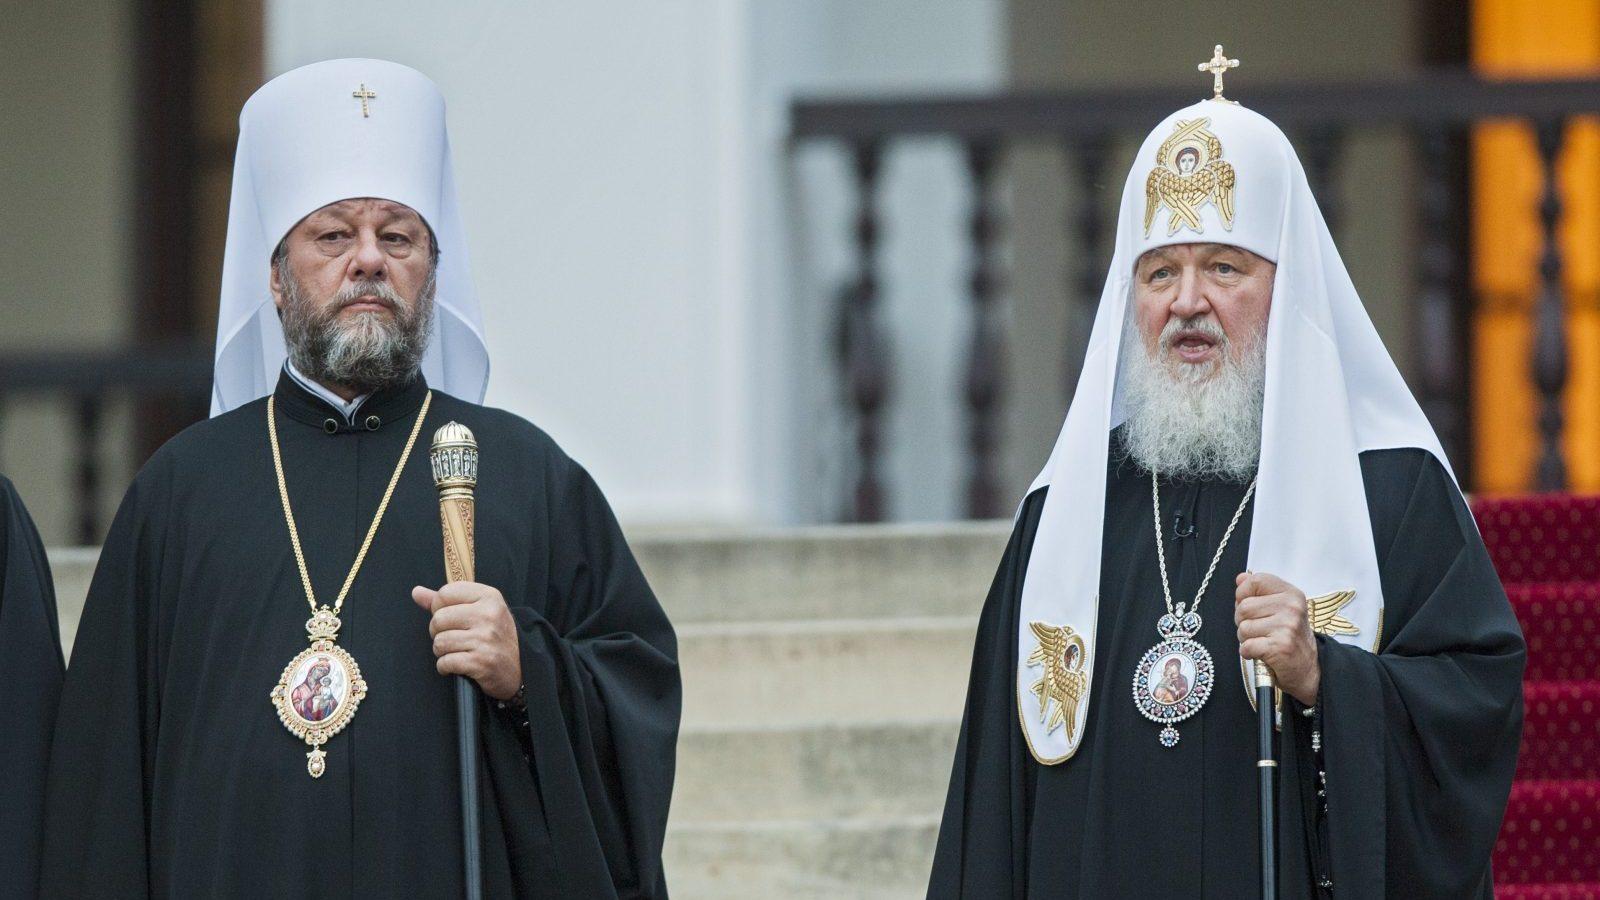 Moldovan Church Denounces COVID Vaccine as Anti-Christian Plot